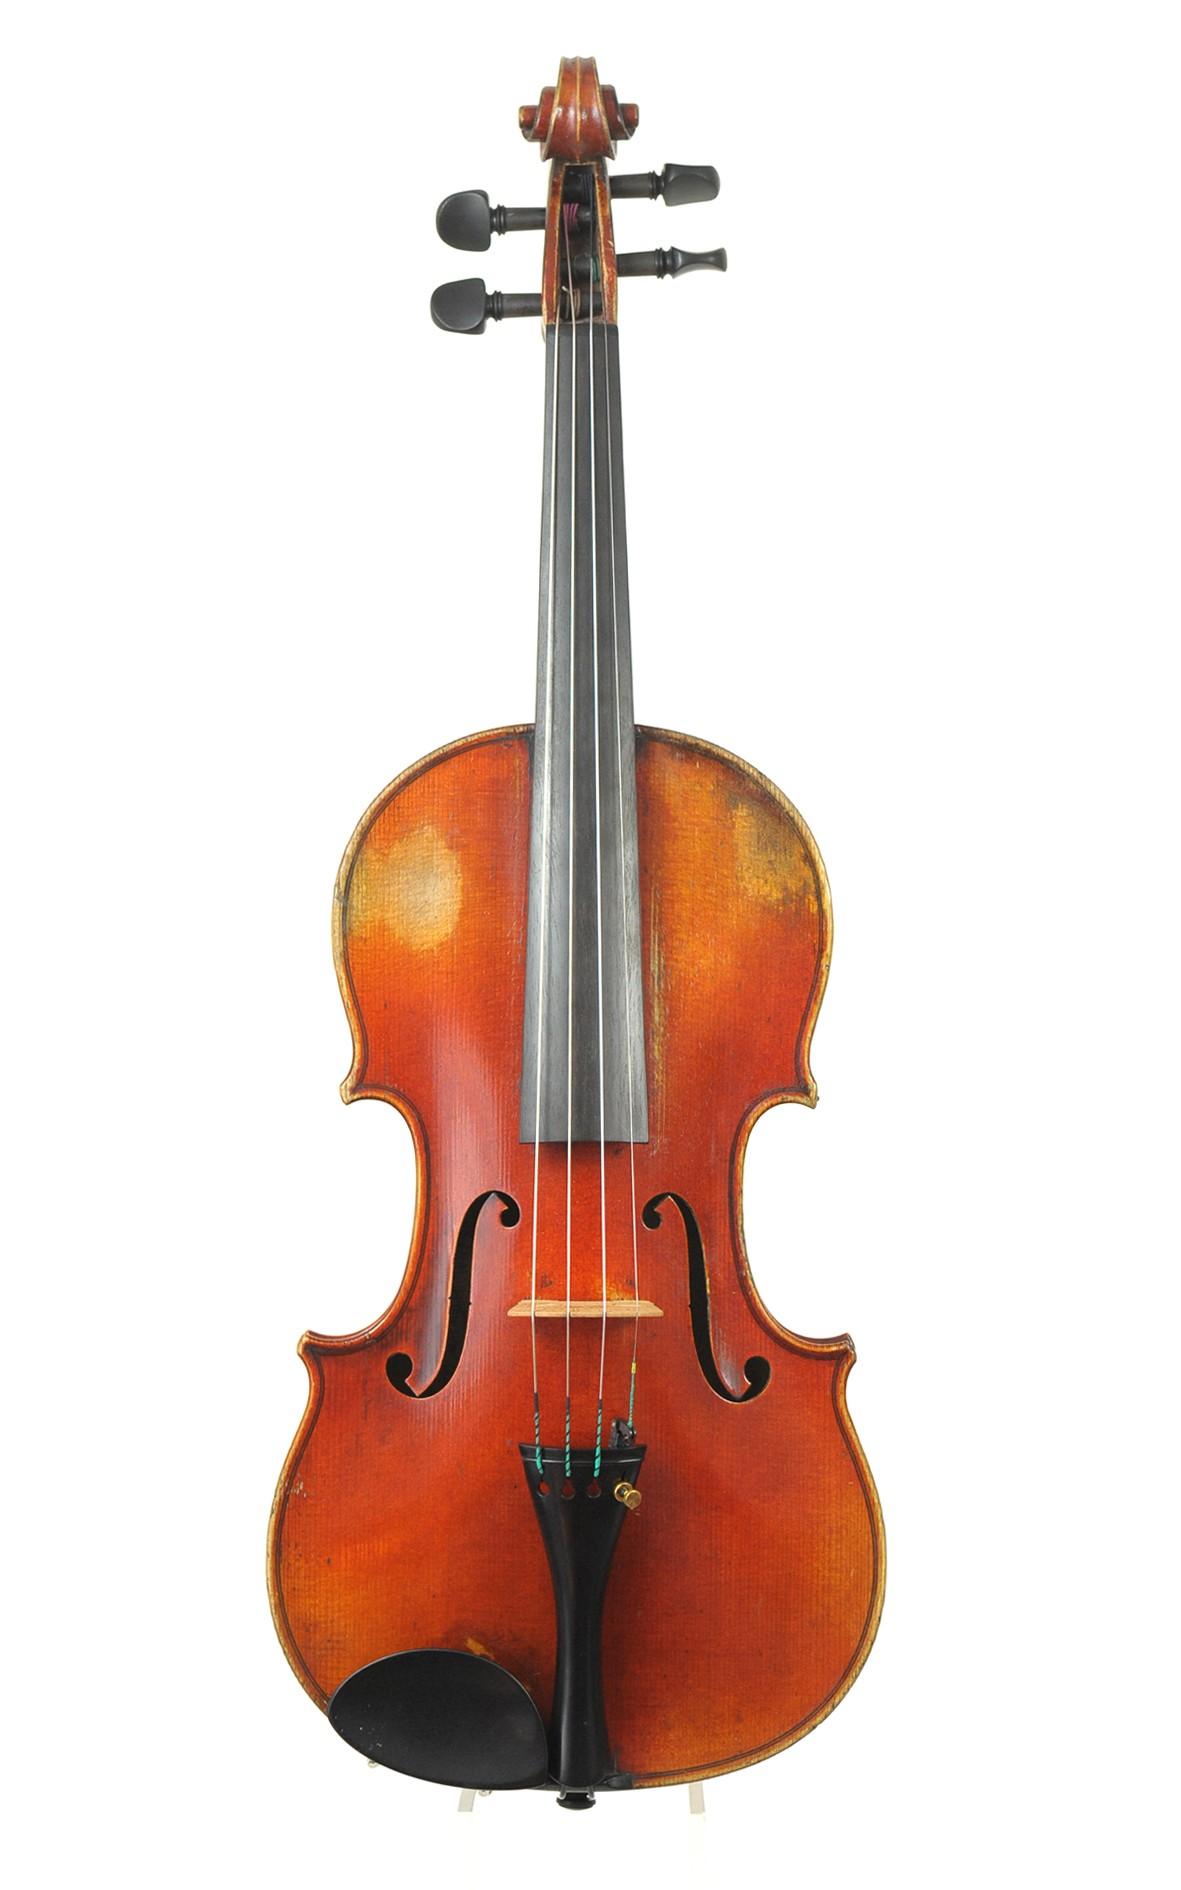 Fine violin by Alexandre Delanoy, Bordeaux, 1900